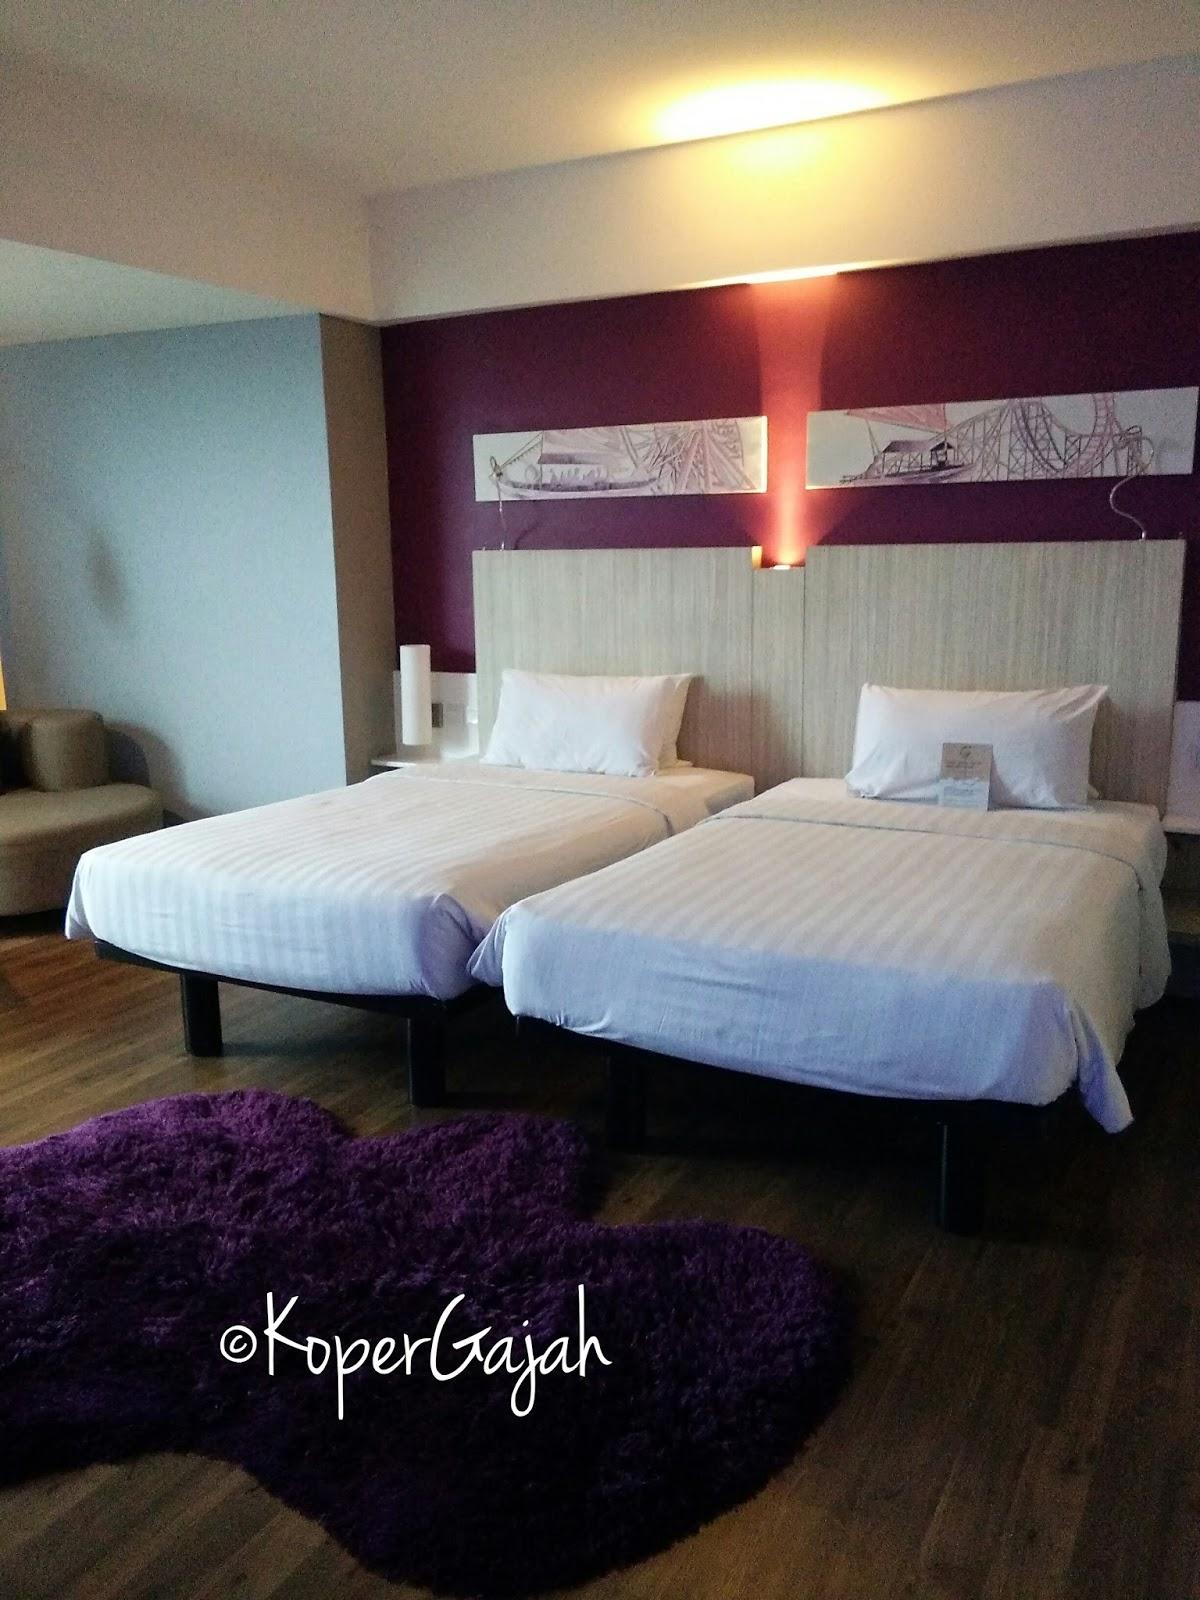 hotel review mercure convention hotel ancol koper gajah rh kopergajah blogspot com